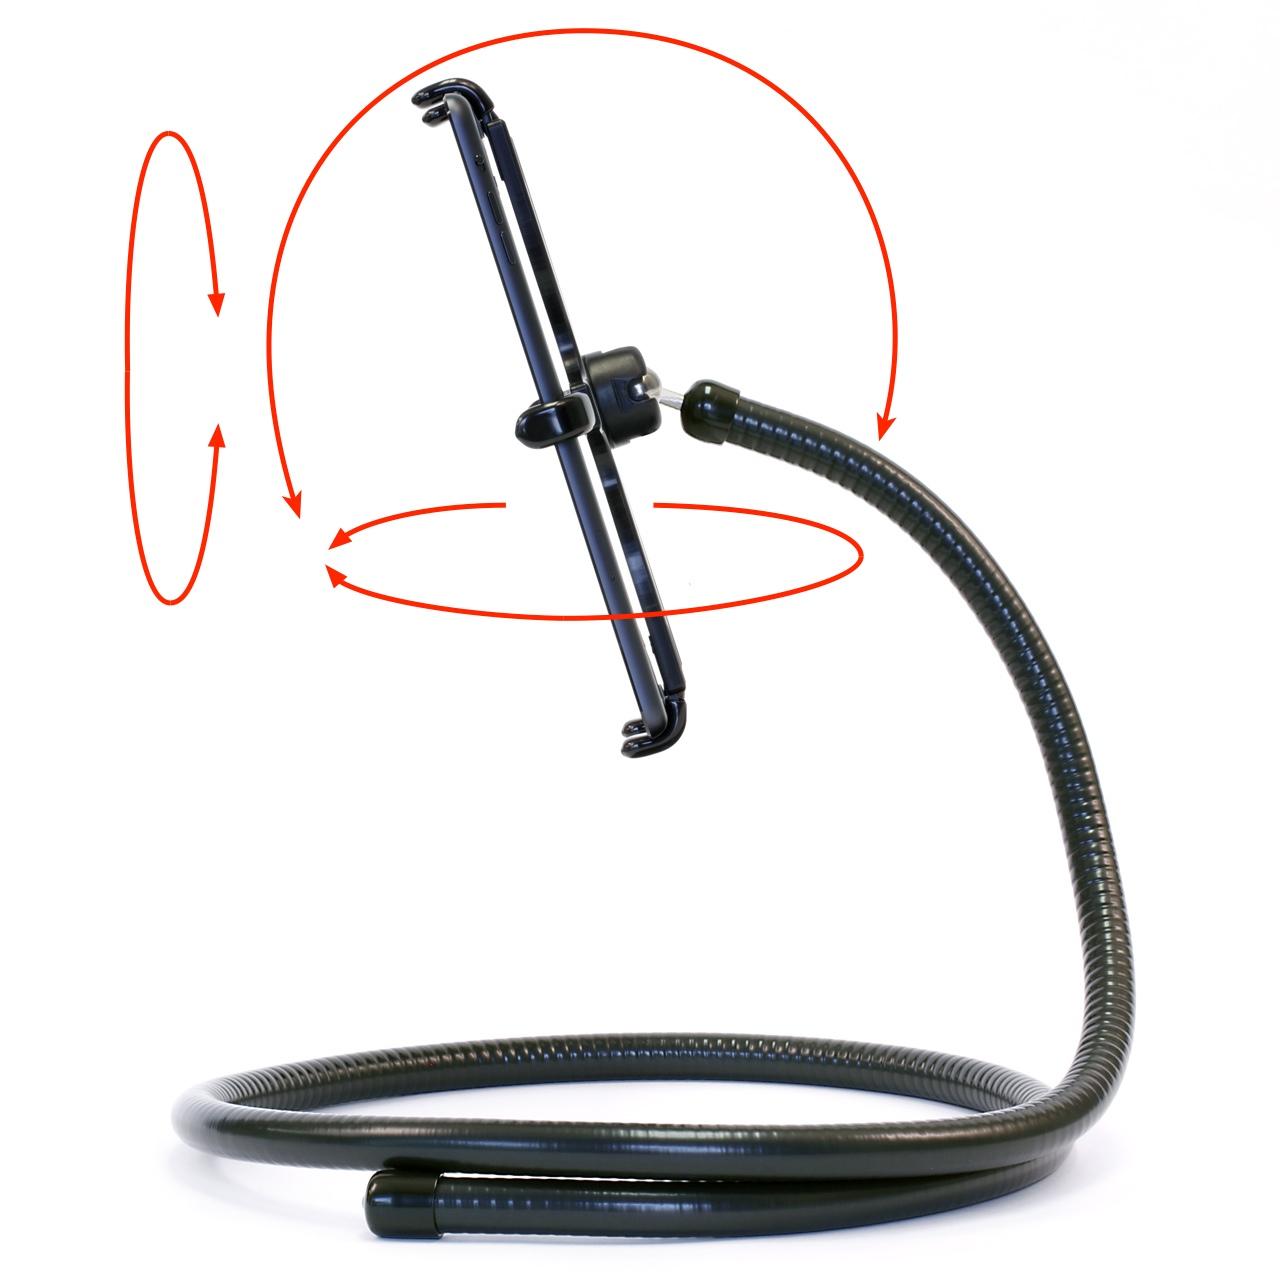 PED4-Coil IPM10 iPad mini Stand Flexible Gooseneck & Pivoting Holder ROLL, PITCH & YAW